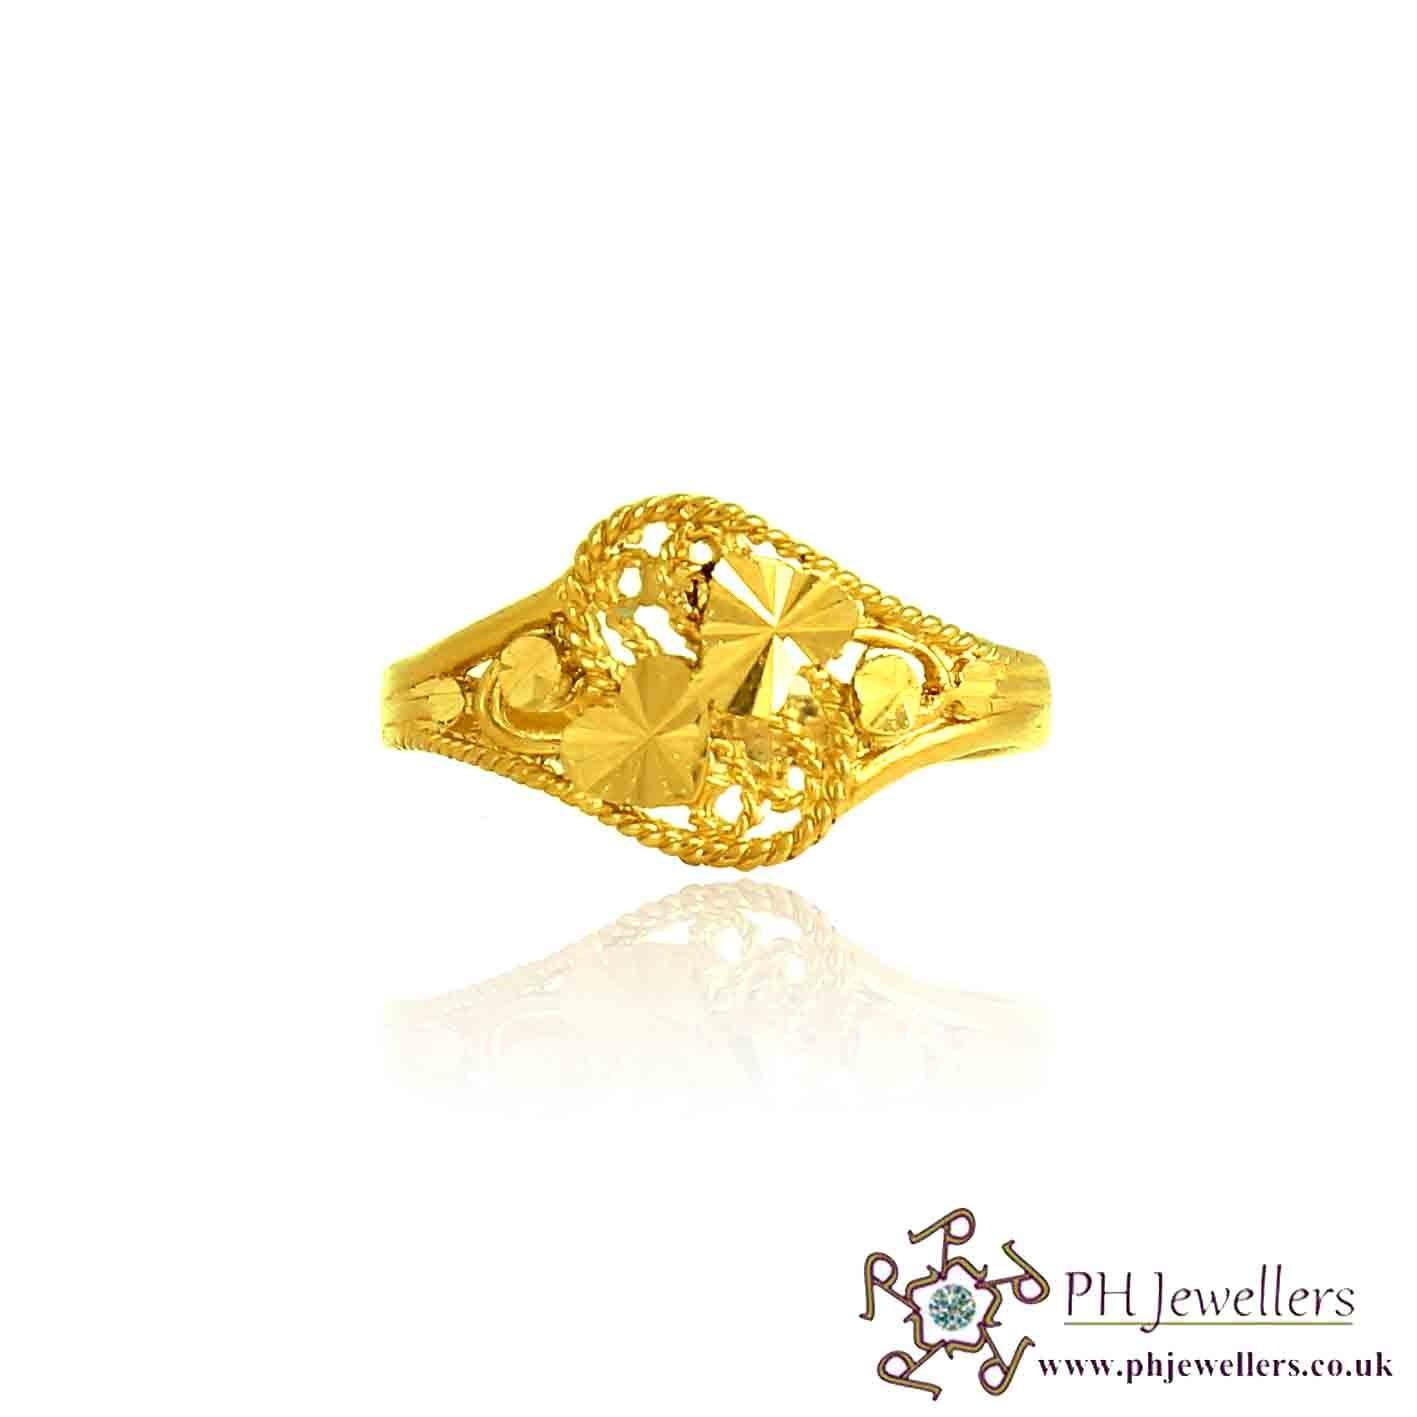 22ct 916 Hallmark Yellow Gold Heart Size Q,R Ring PR22